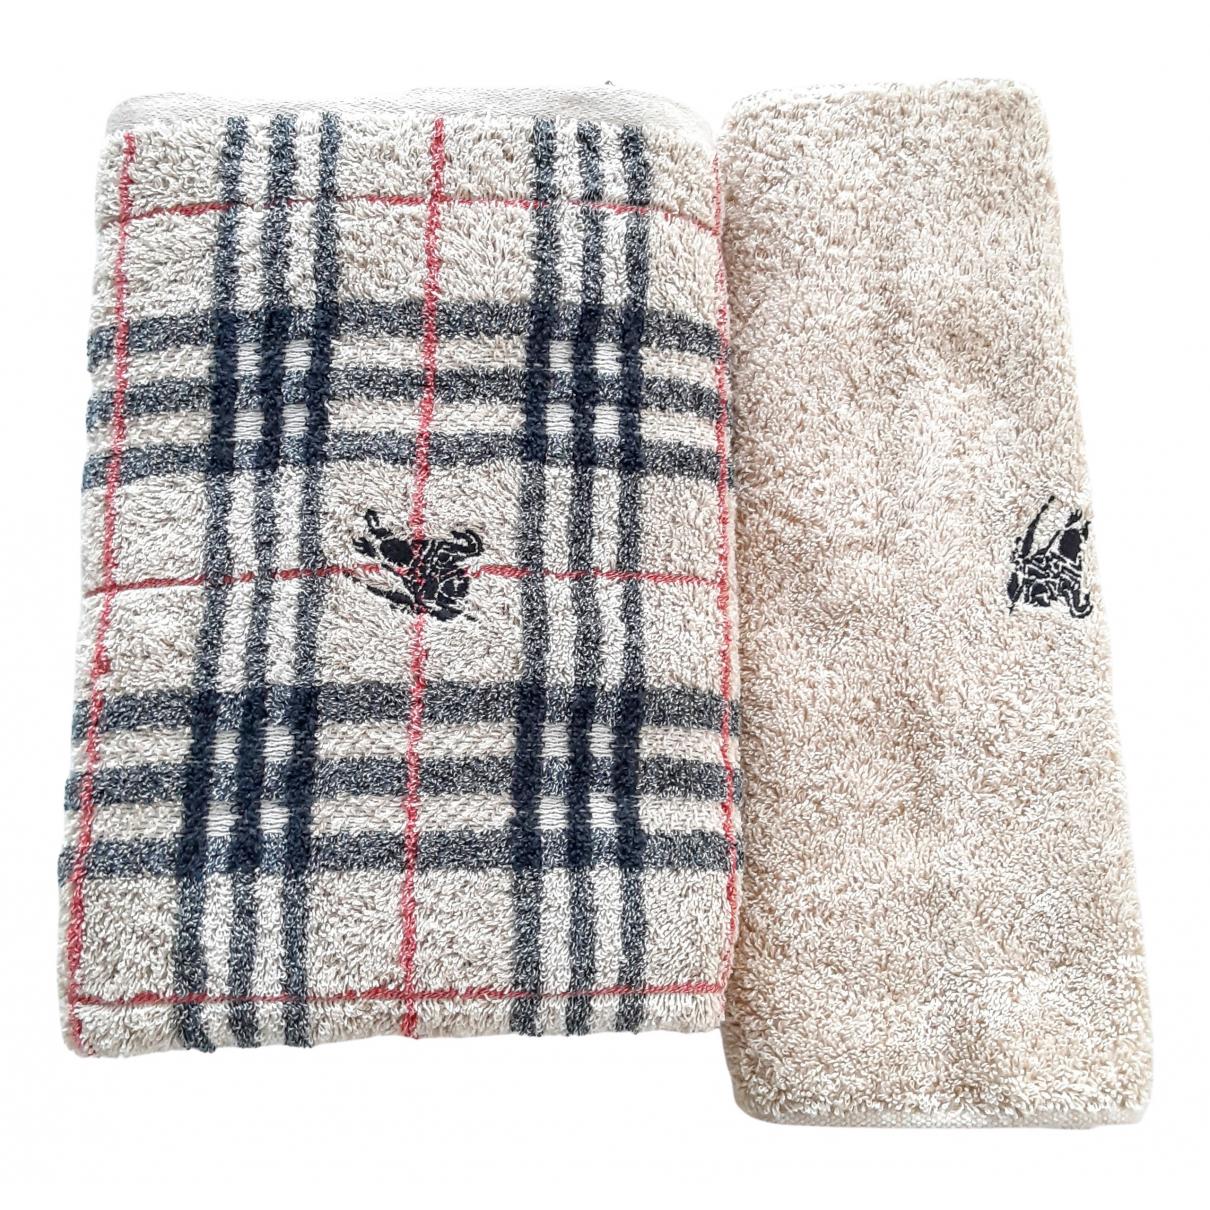 Textil de hogar de Lana Burberry